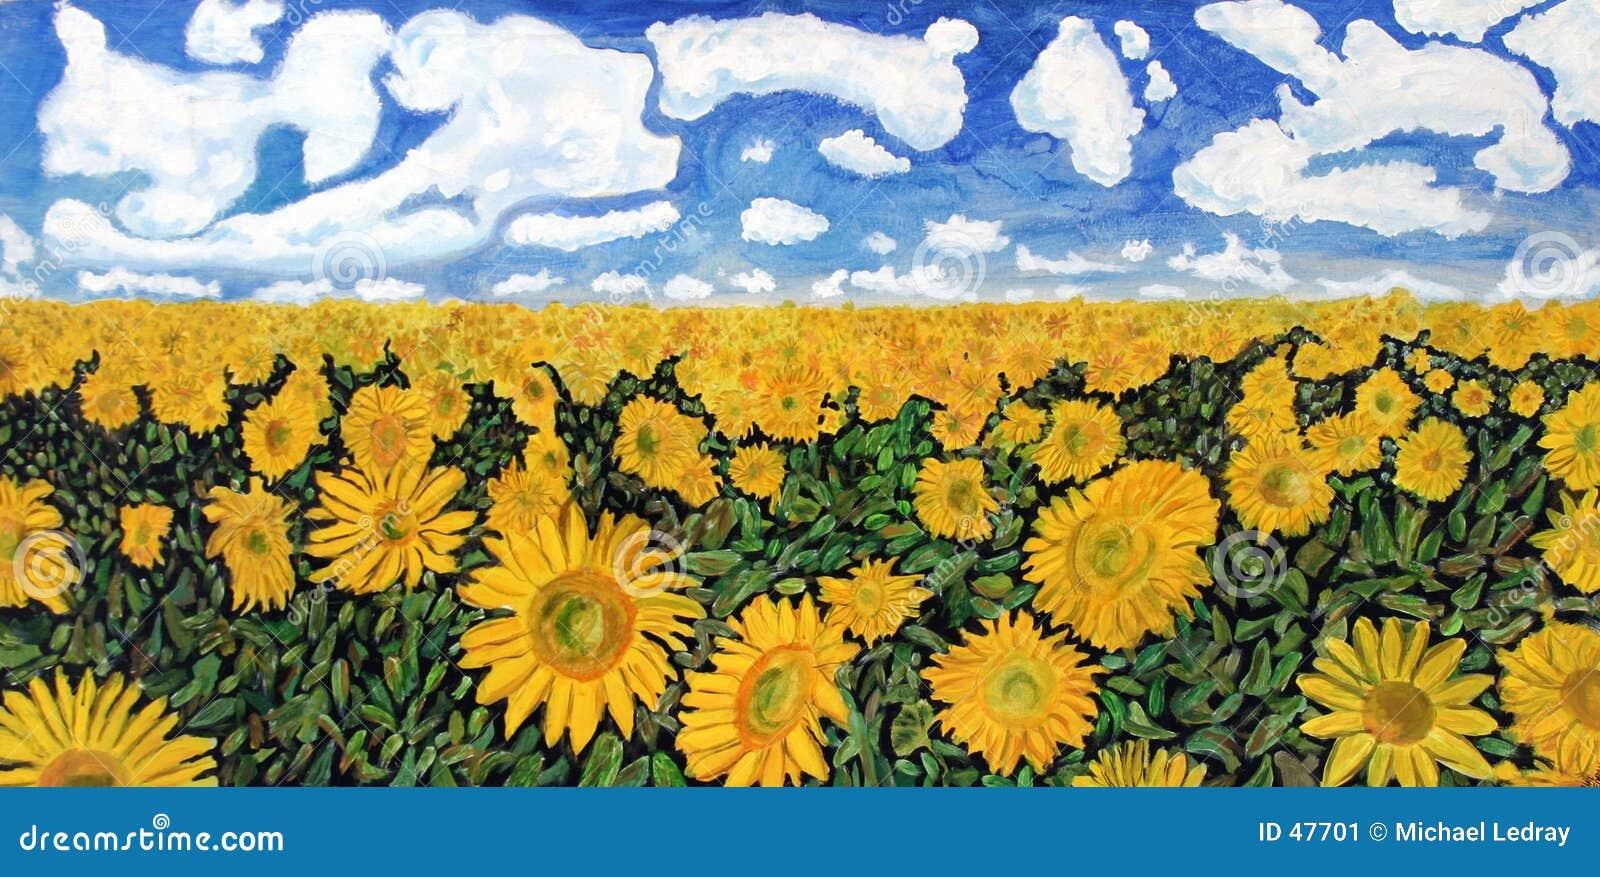 Download Sunflowers stock illustration. Illustration of blue, sunflowers - 47701